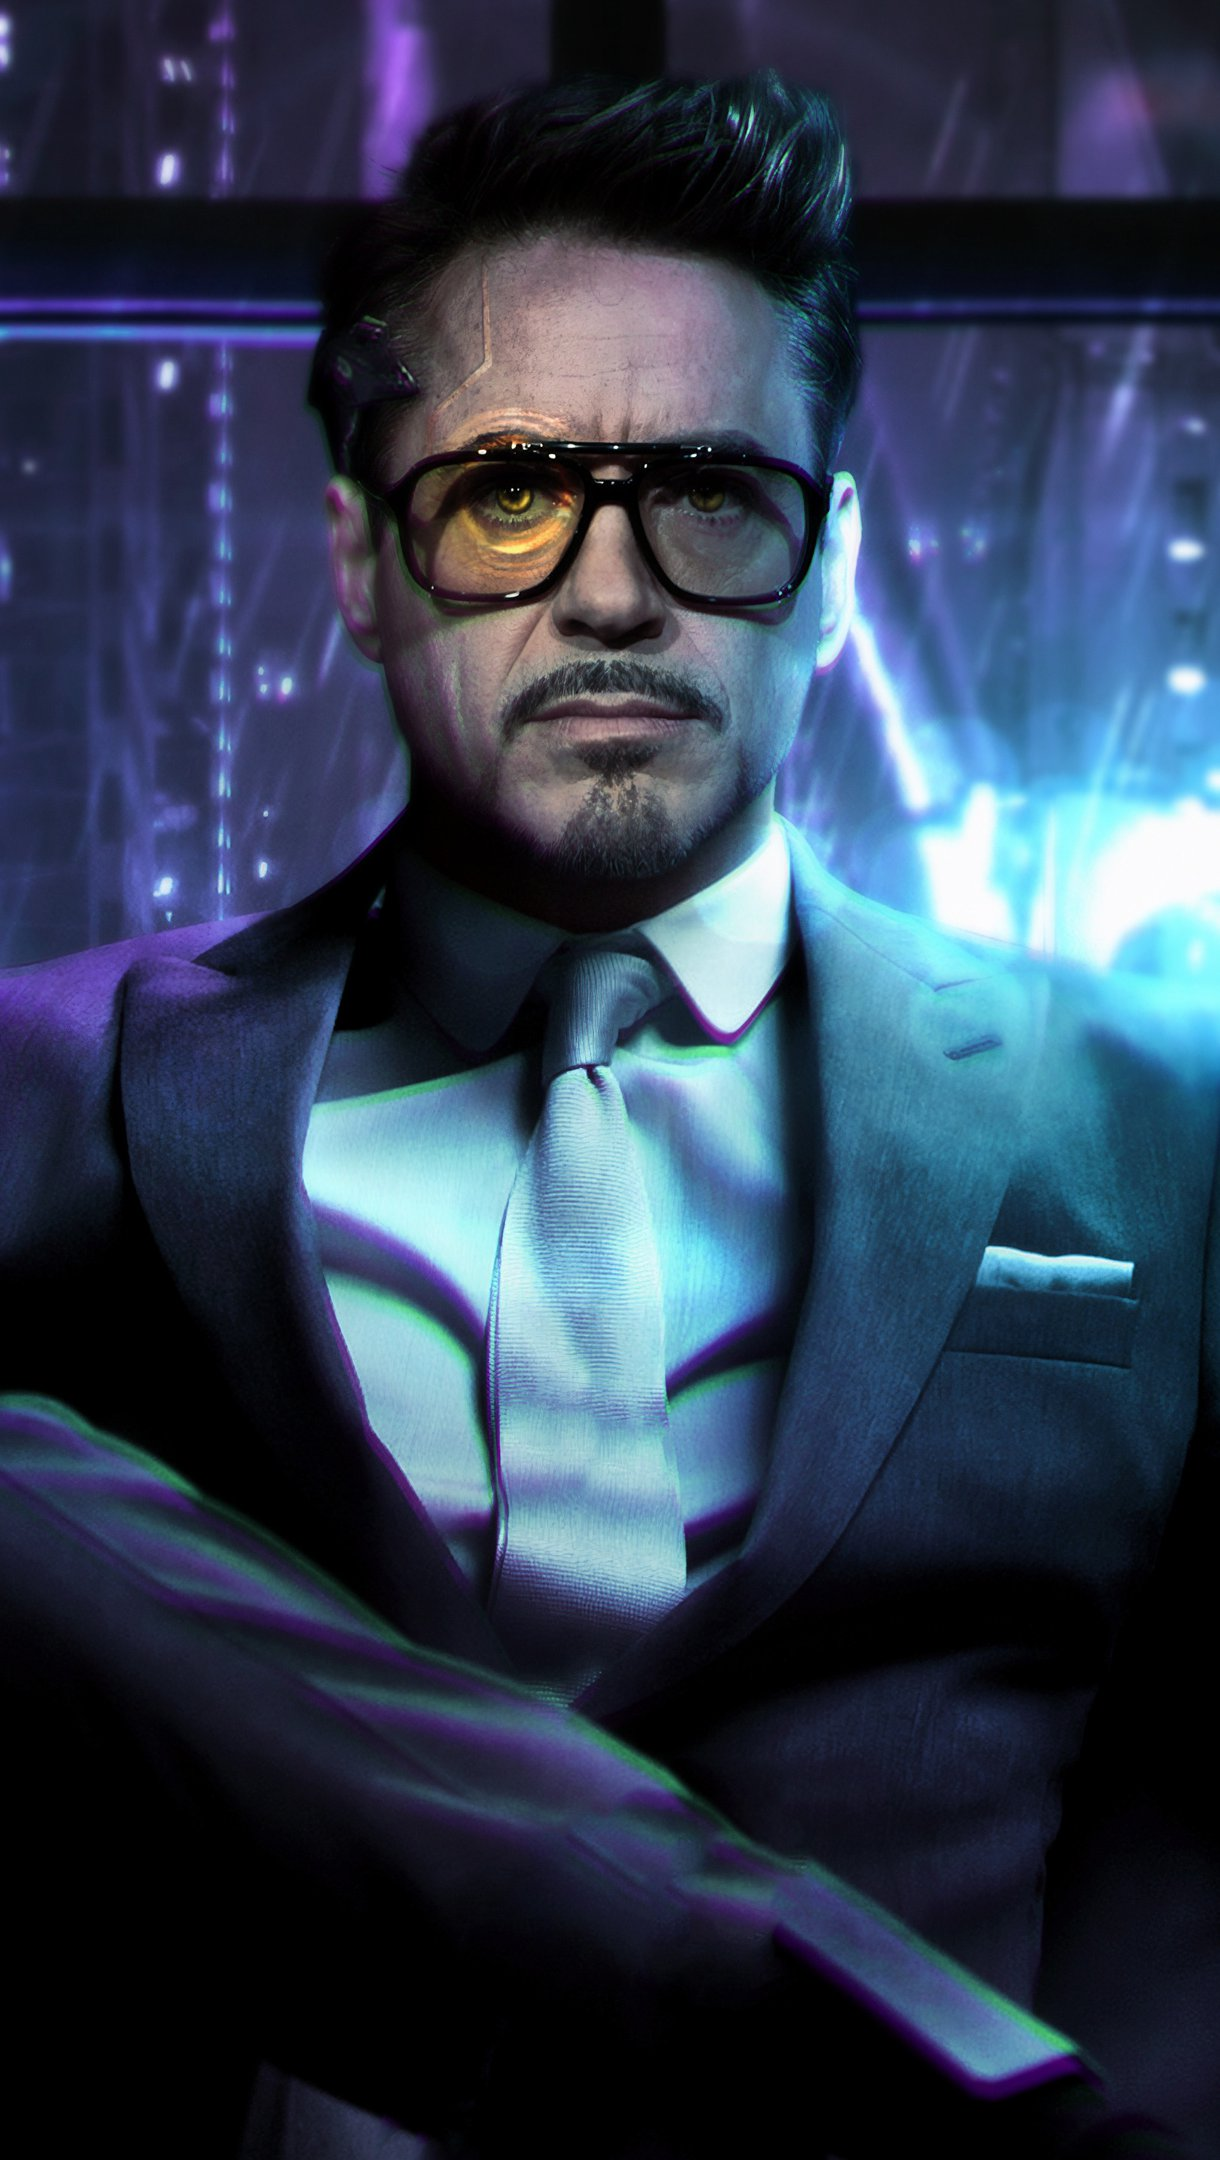 Wallpaper Cyberpunk Tony Stark Fanart Vertical